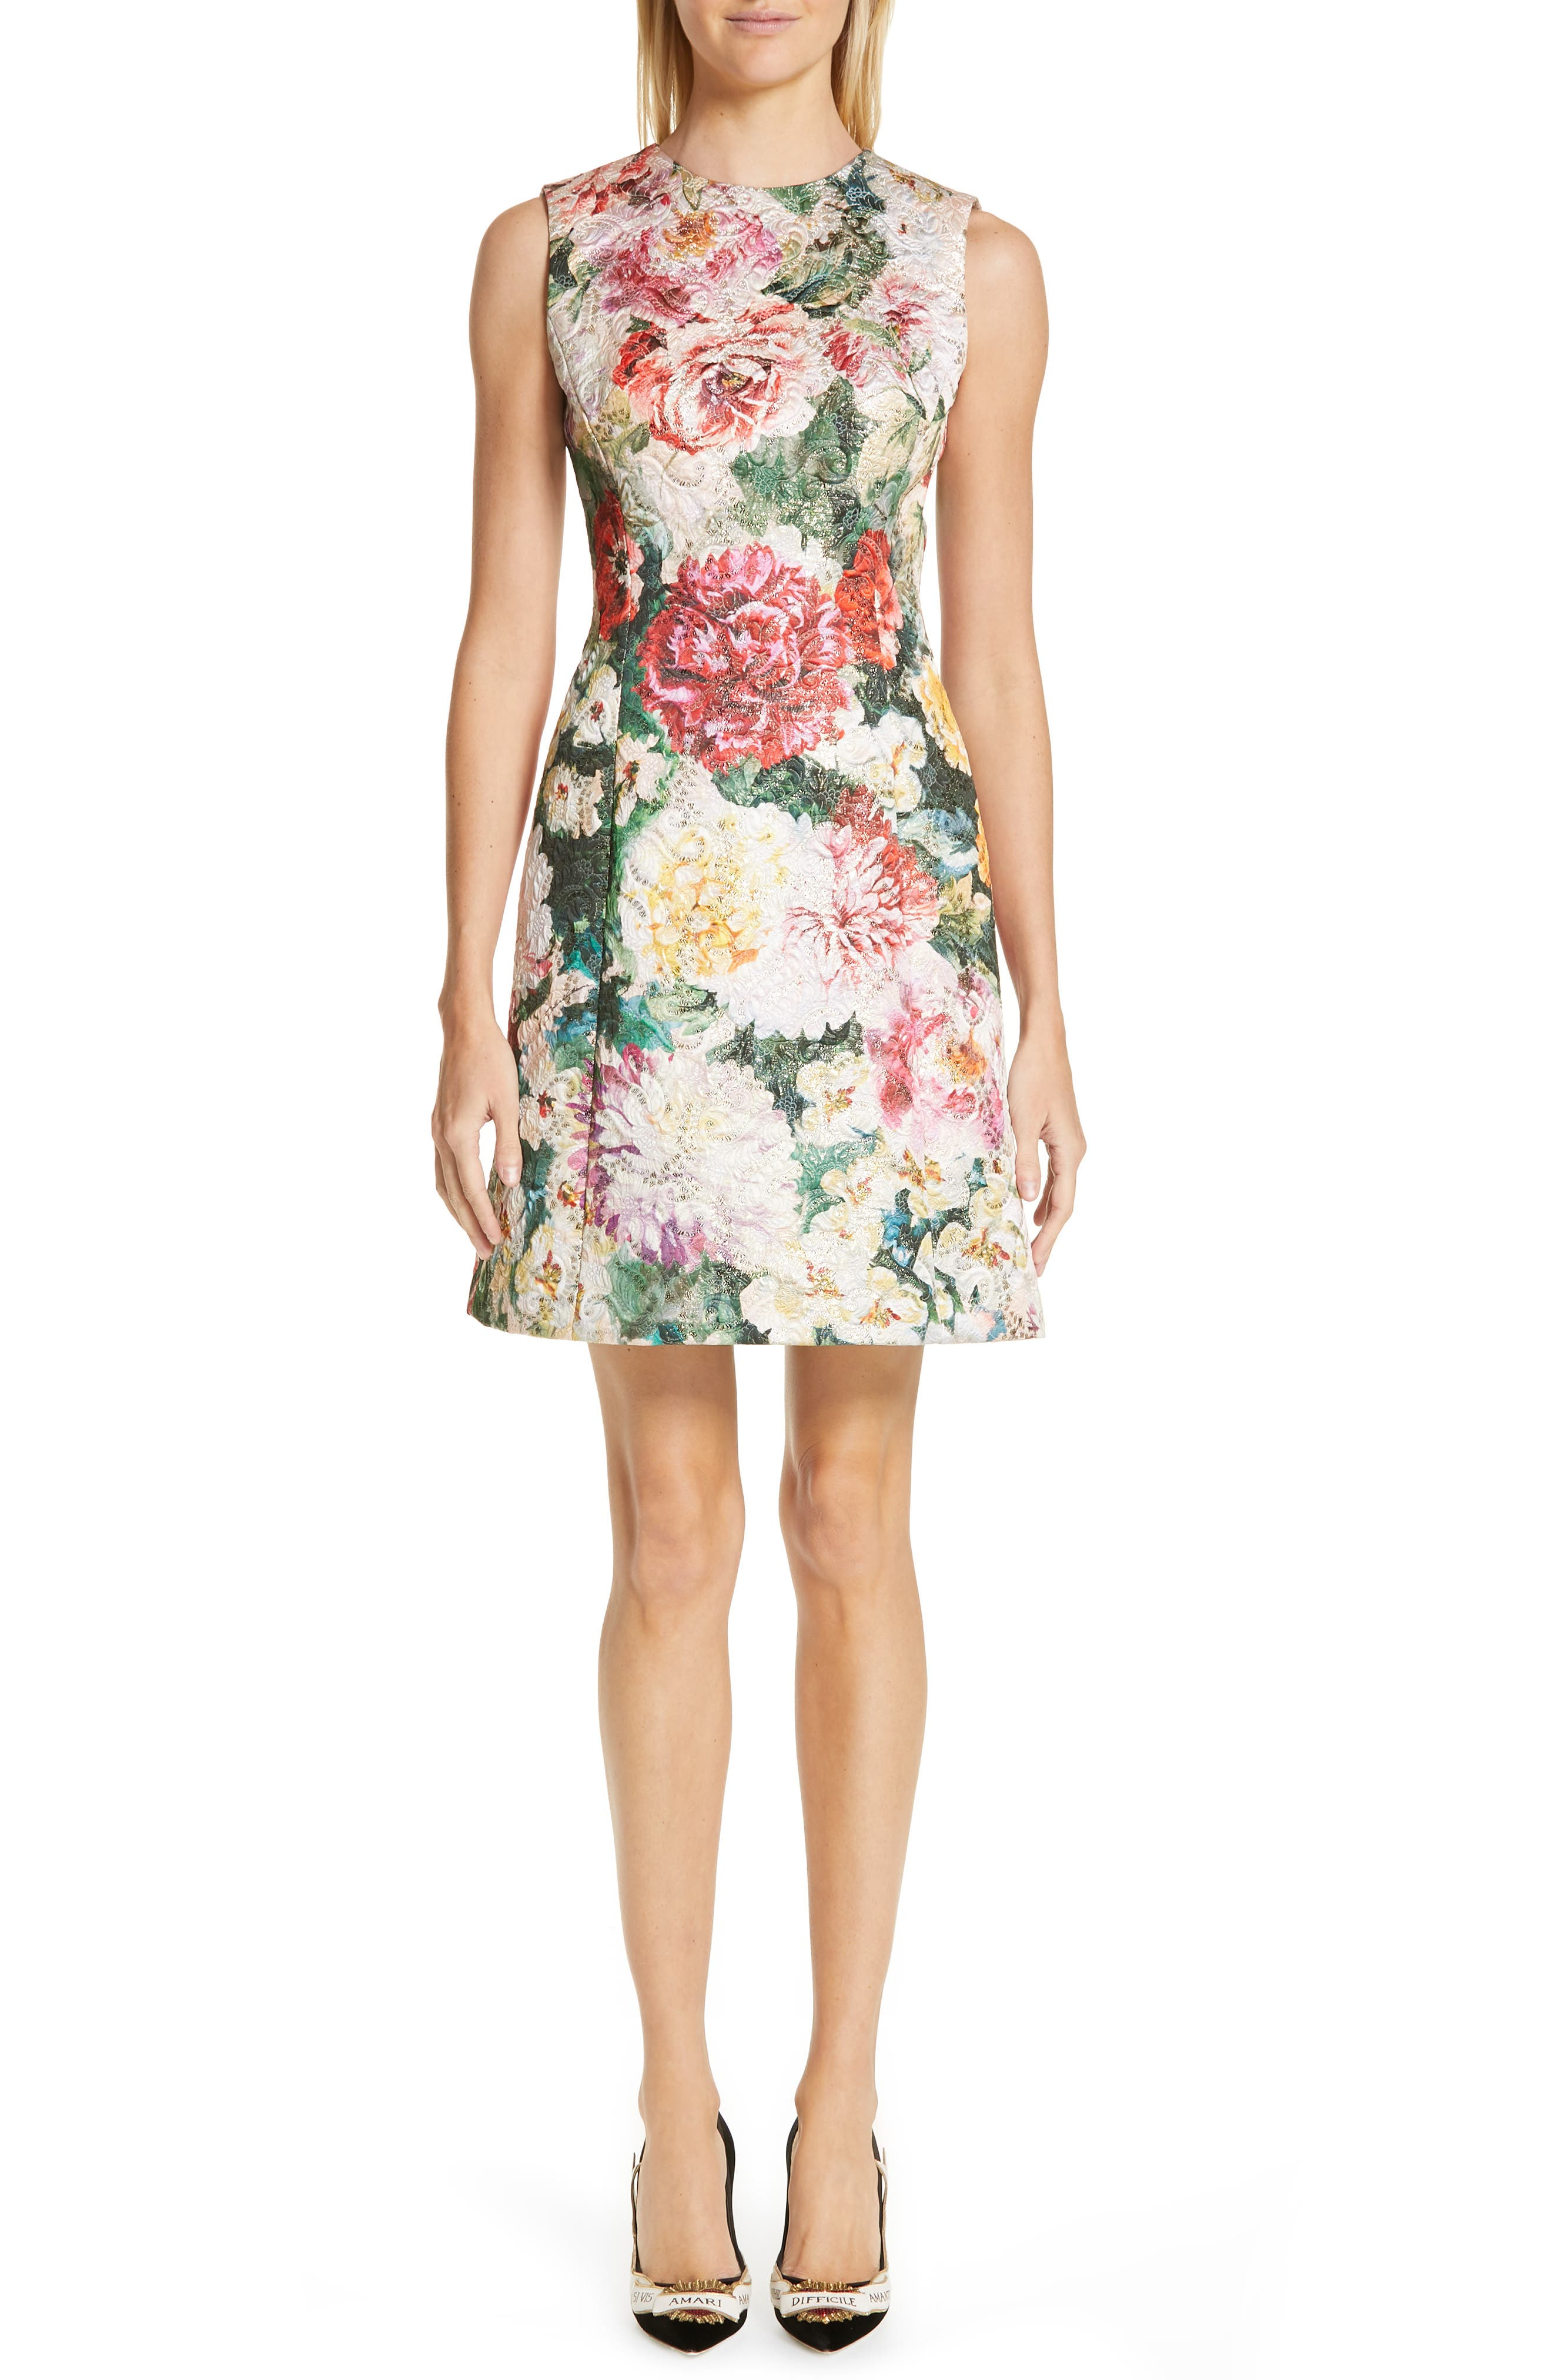 Dolce & gabbana Floral Print Brocade Dress, US / 44 IT - Pink